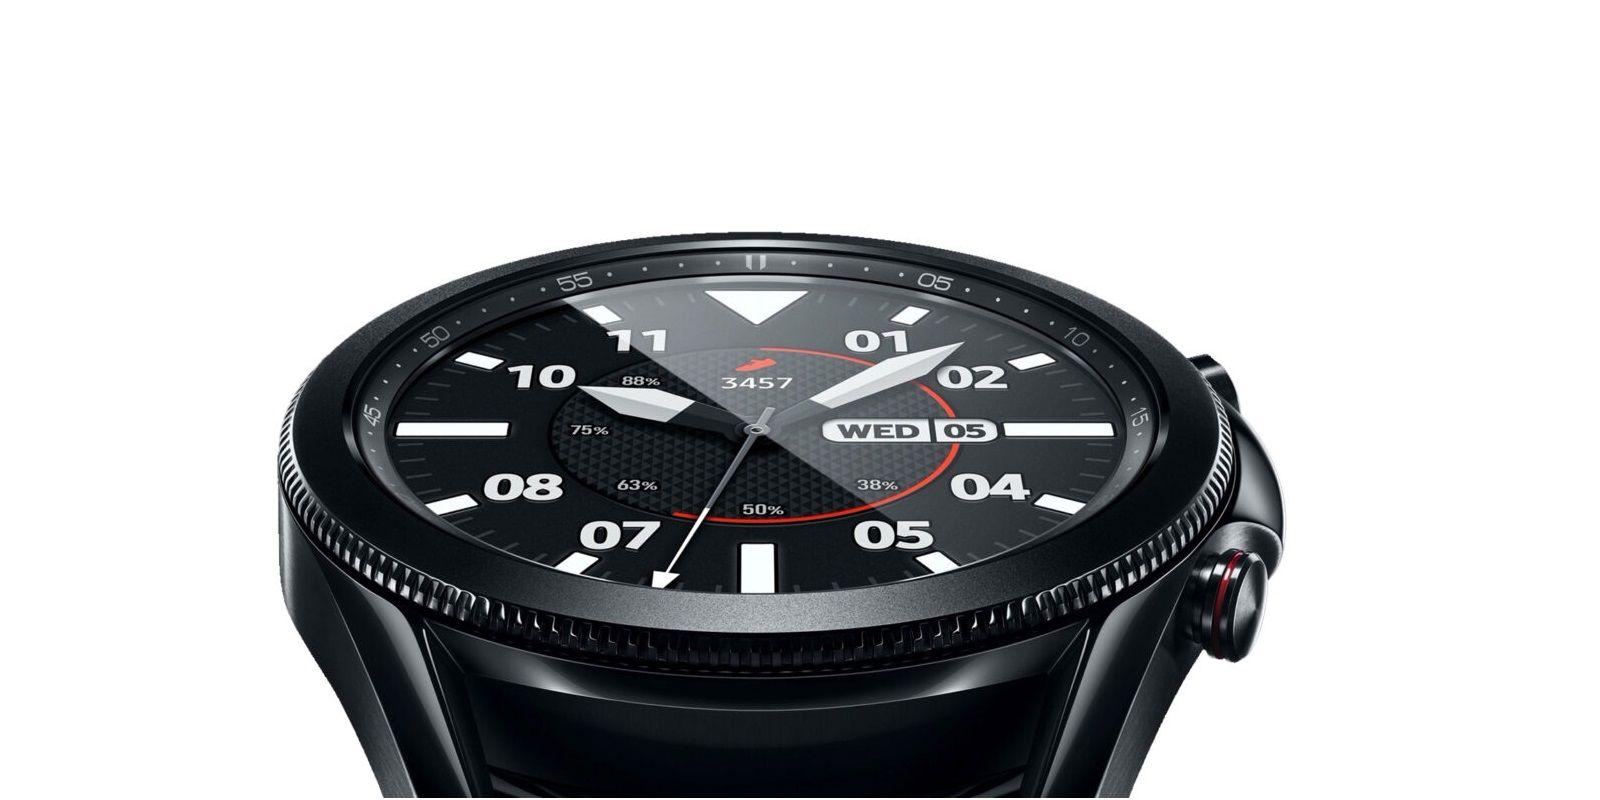 Samsung, Galaxy Watch 3, smartwatch, wearable,